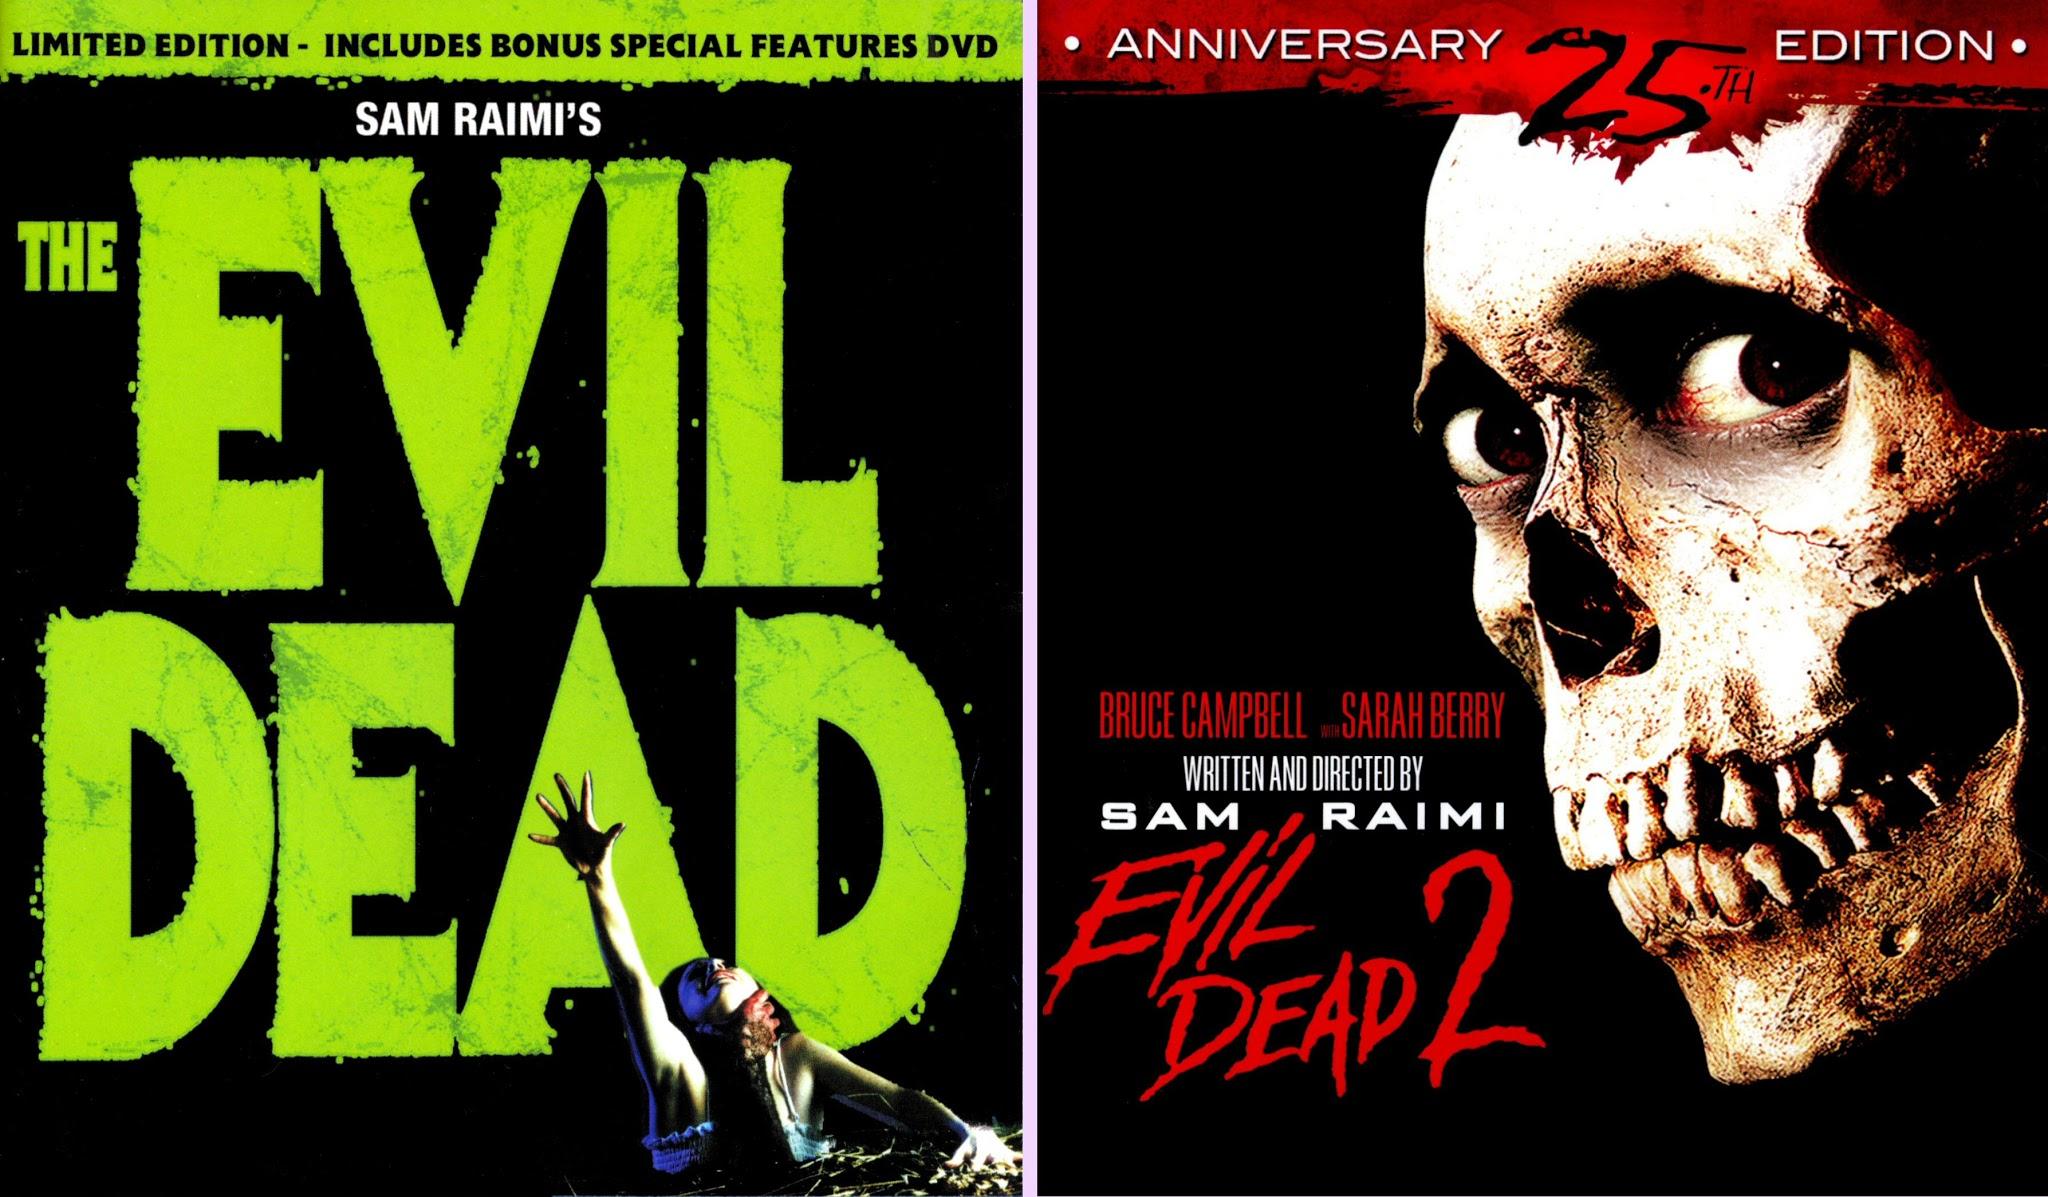 The Definitive Evil Dead 1 and 2 (Laserdisc/ DVD/ Blu-ray/ UHD Comparison)